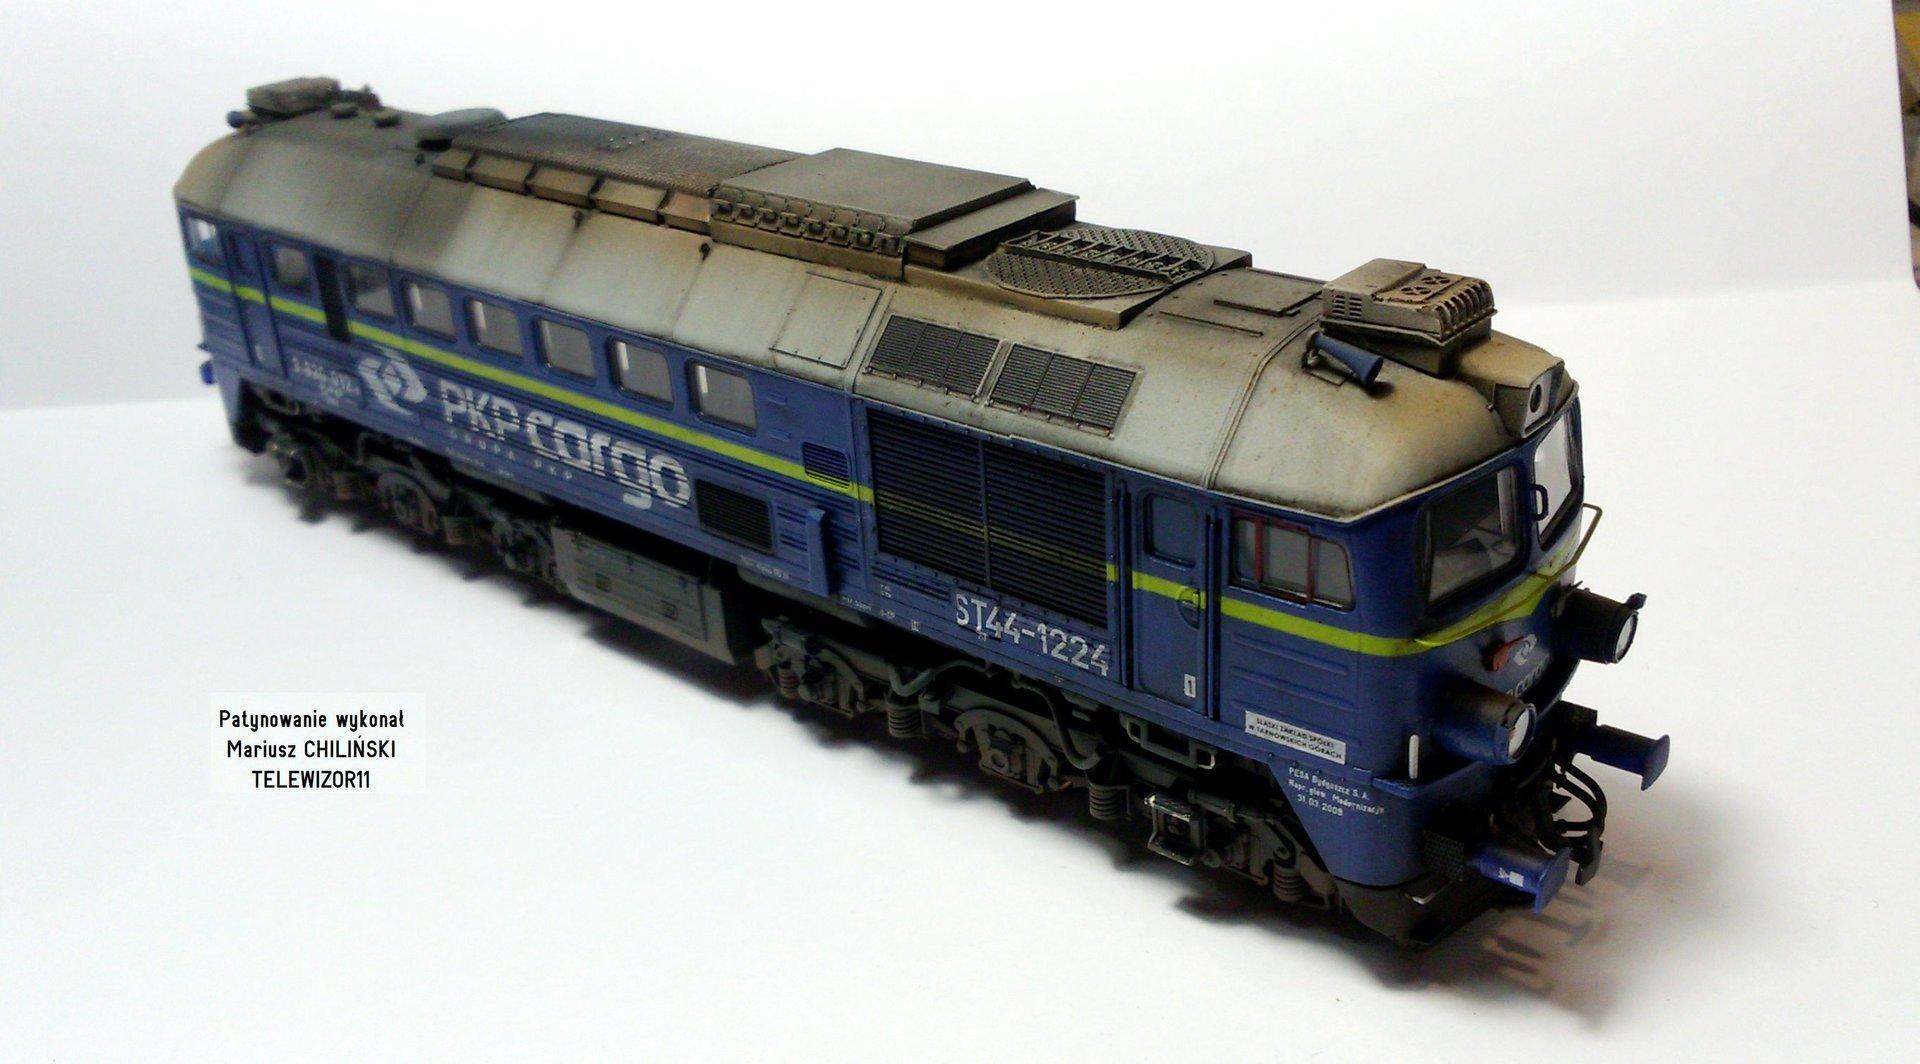 DSC_0762.JPG